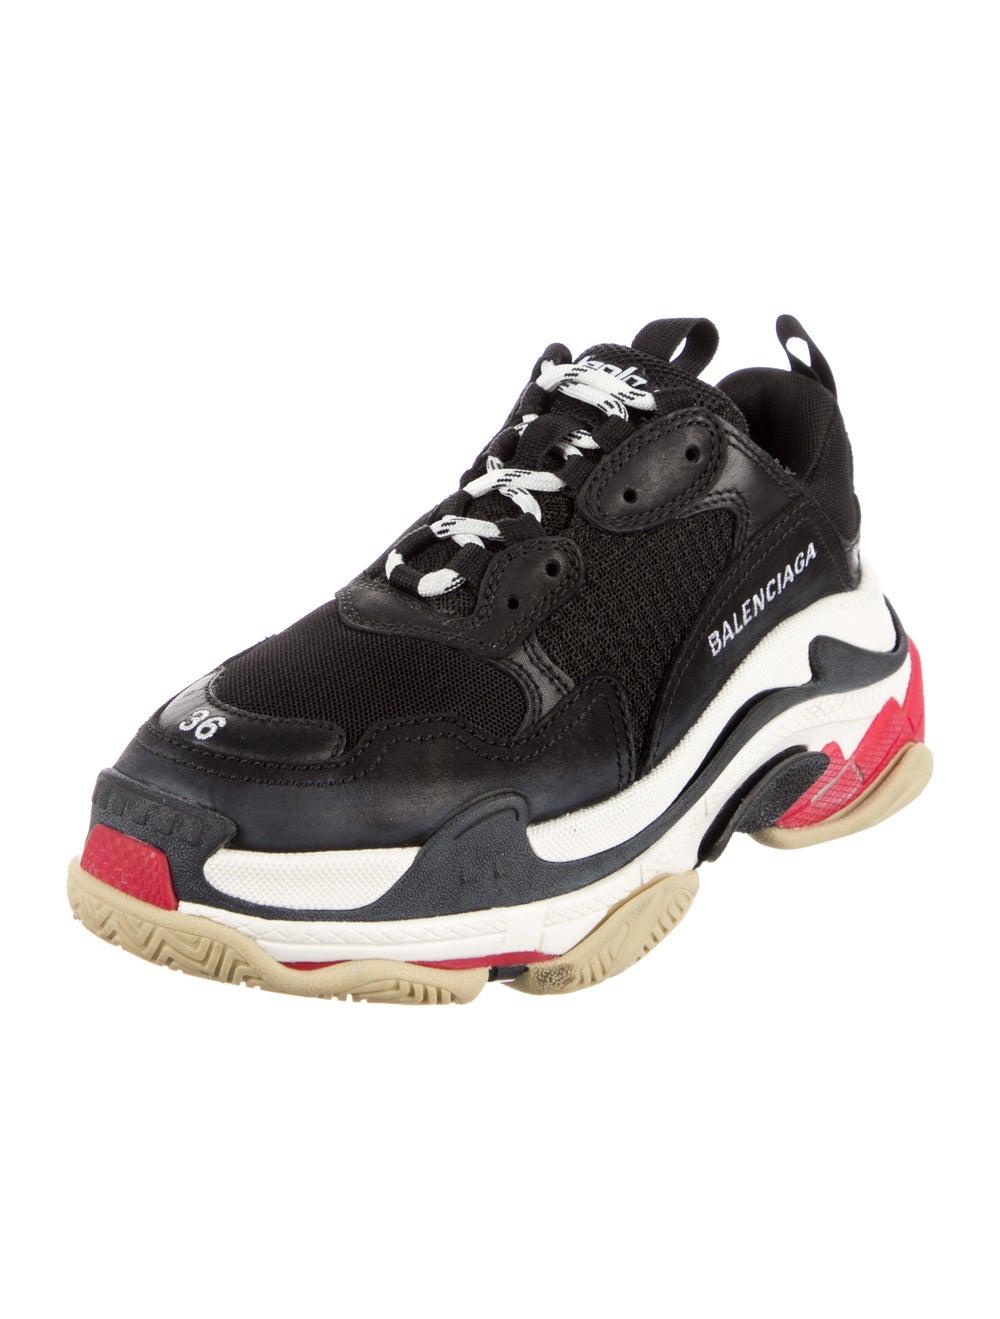 Balenciaga Triple S Sneakers Chunky Sneakers Black - image 2